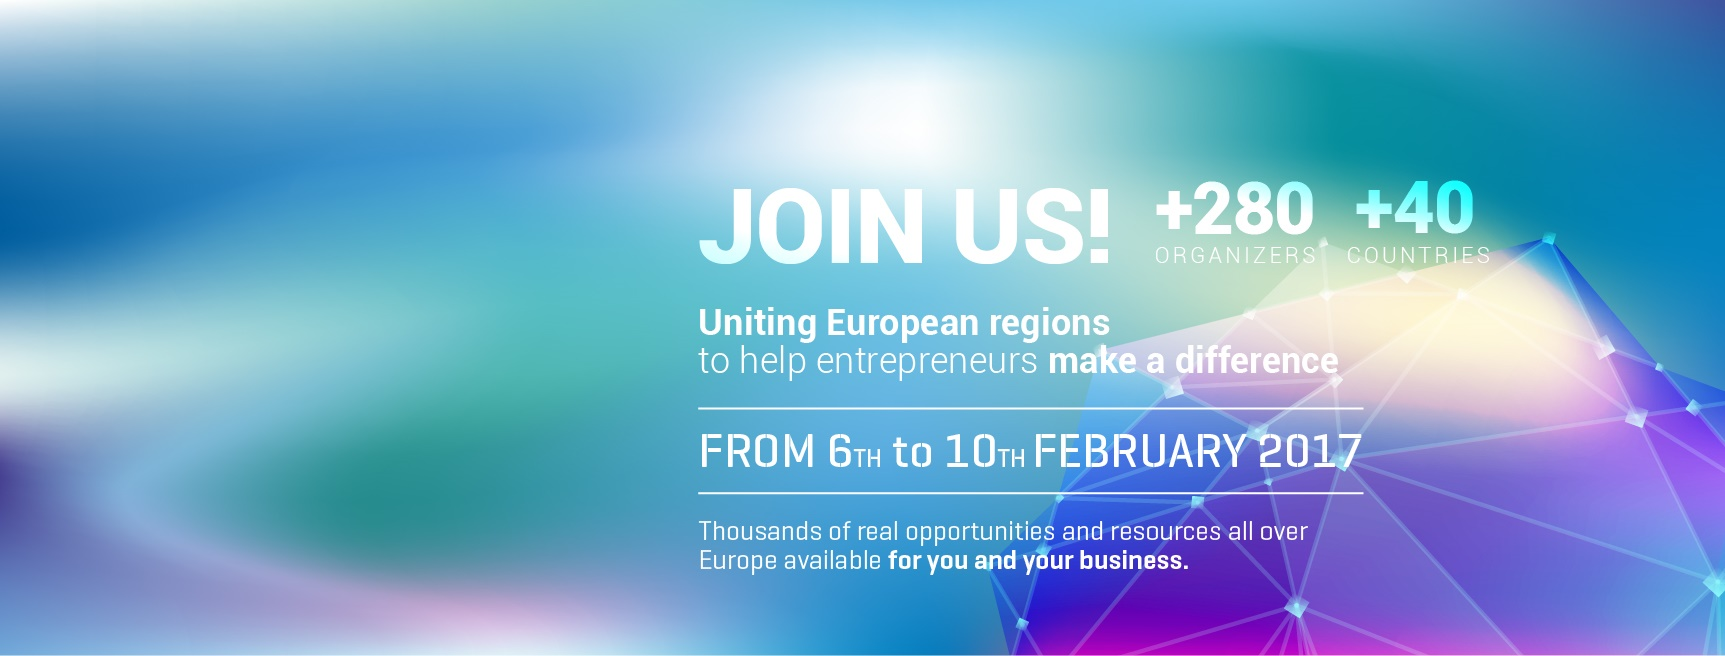 Foto STARTUP EUROPE WEEK VENICE 6-10 febbraio 2017